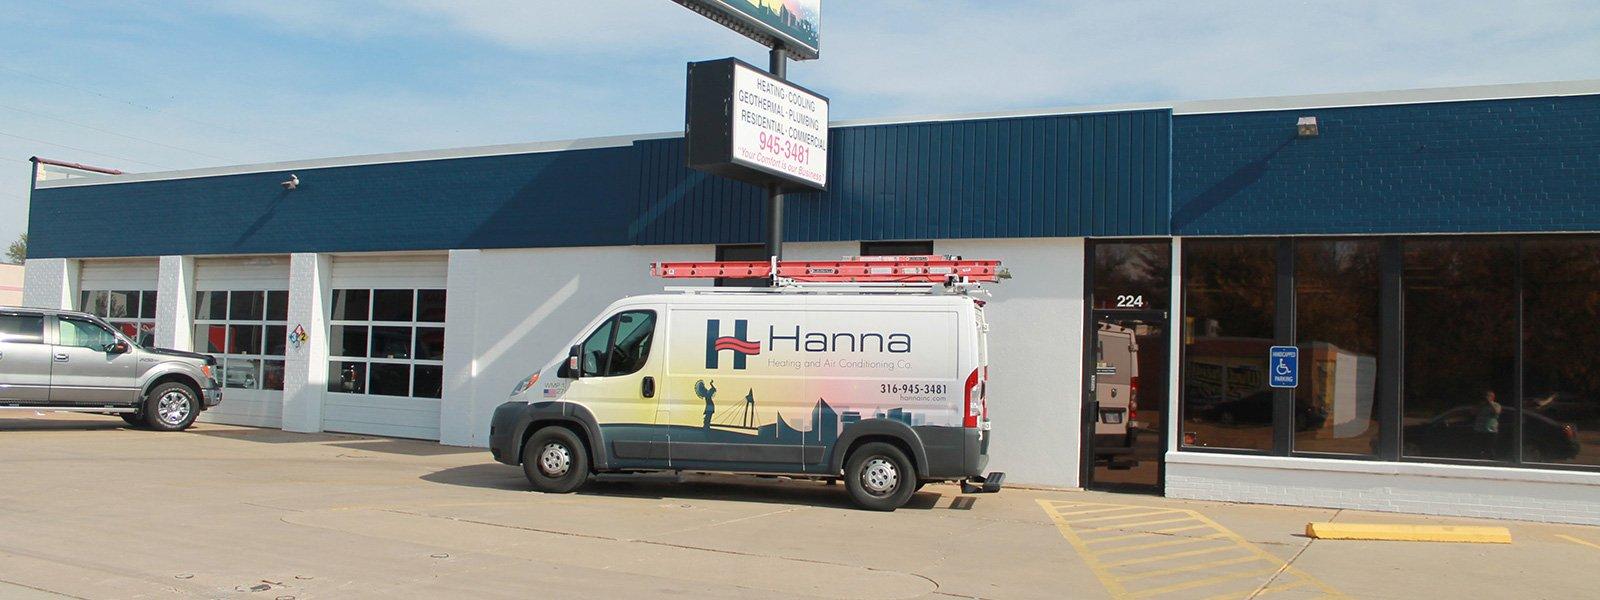 Hanna Heating & Air van in front of West Wichita shop